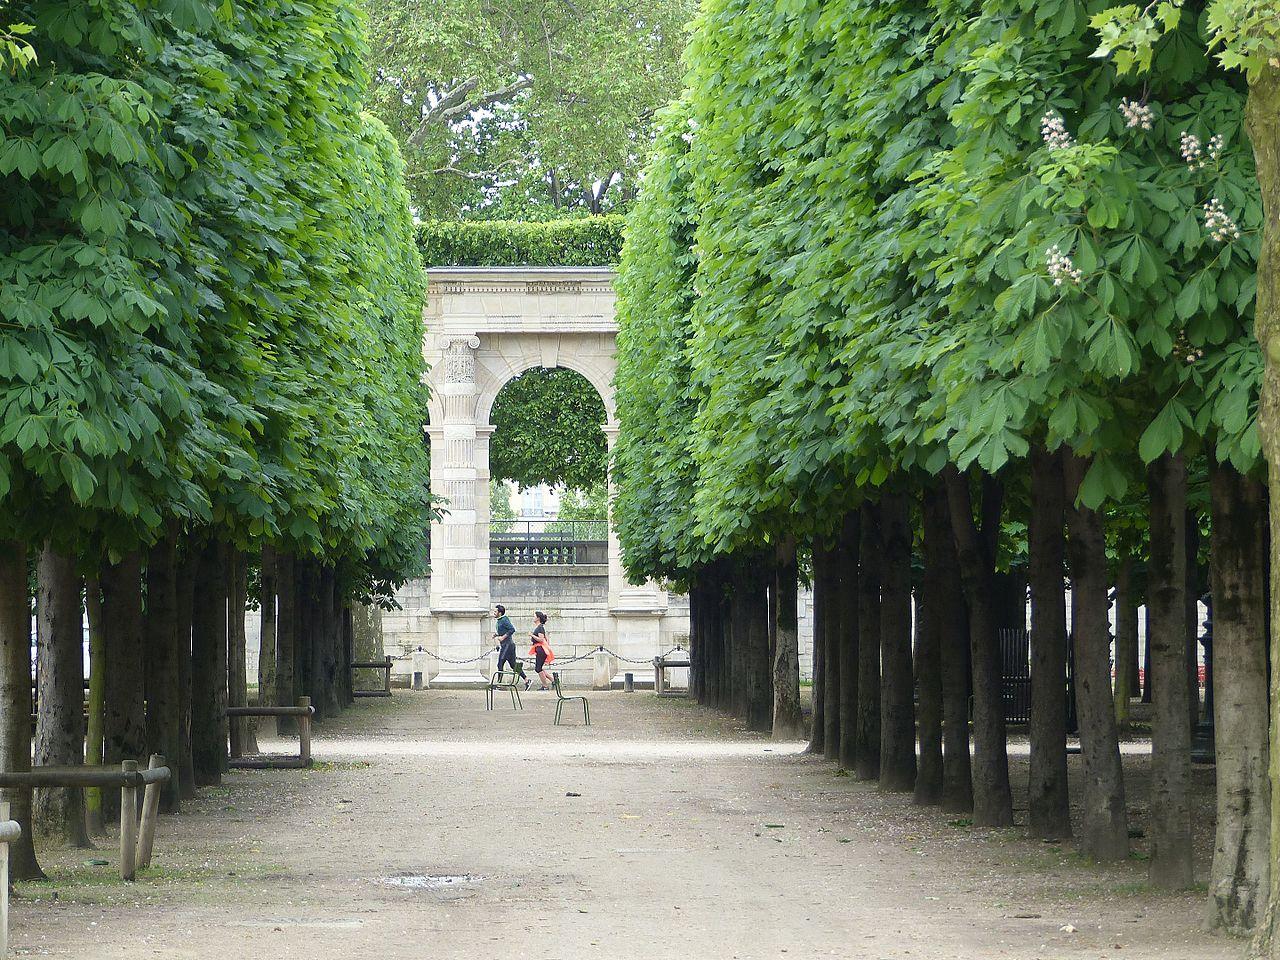 Сад Тюильри, аллея